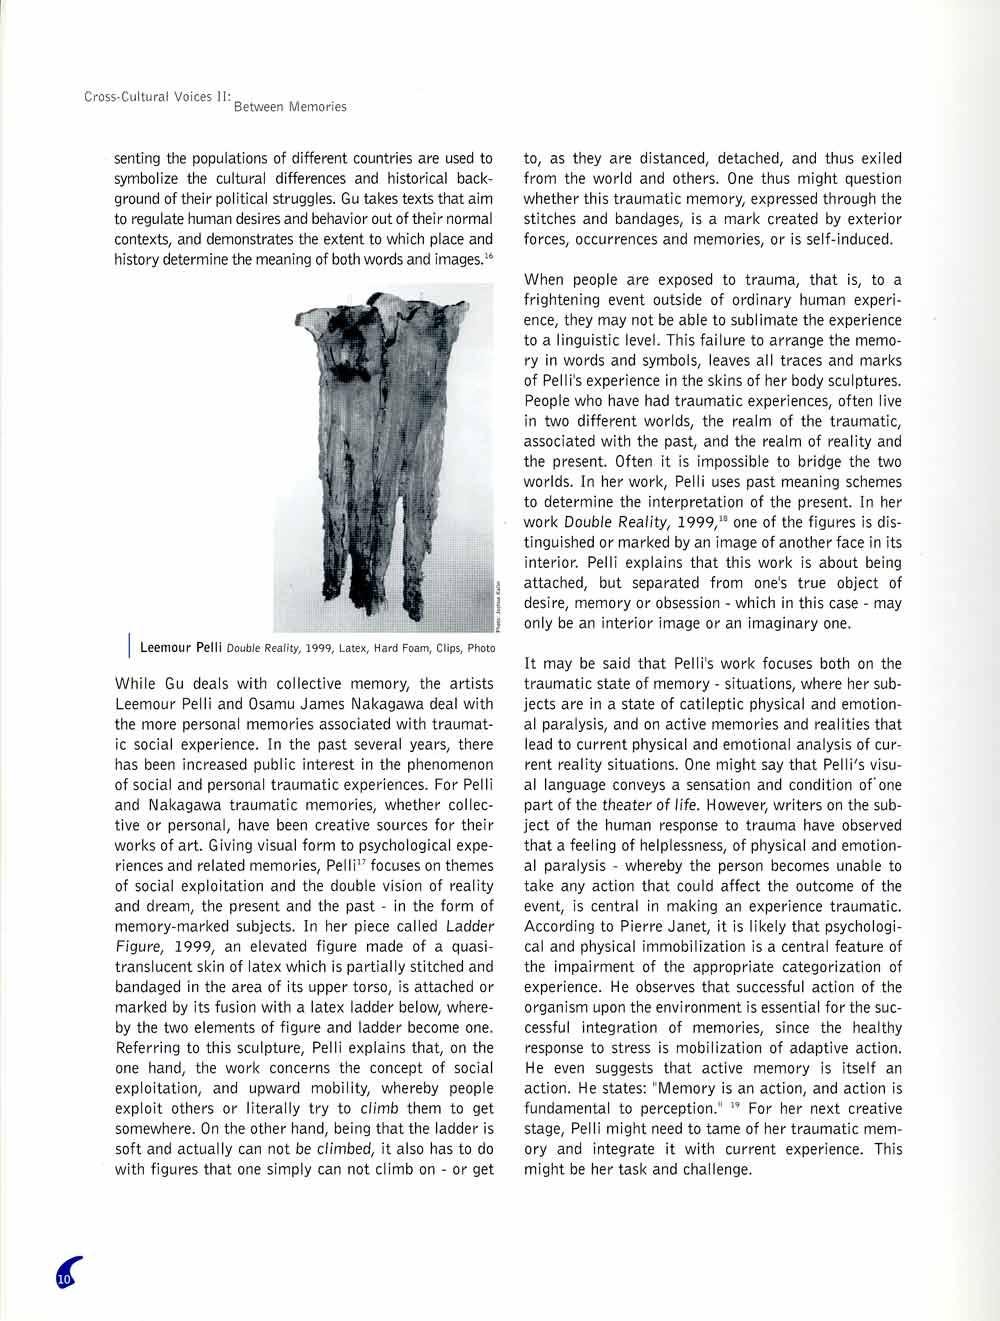 Cross-Cultural Voices II, exhibition catalog, pg 7